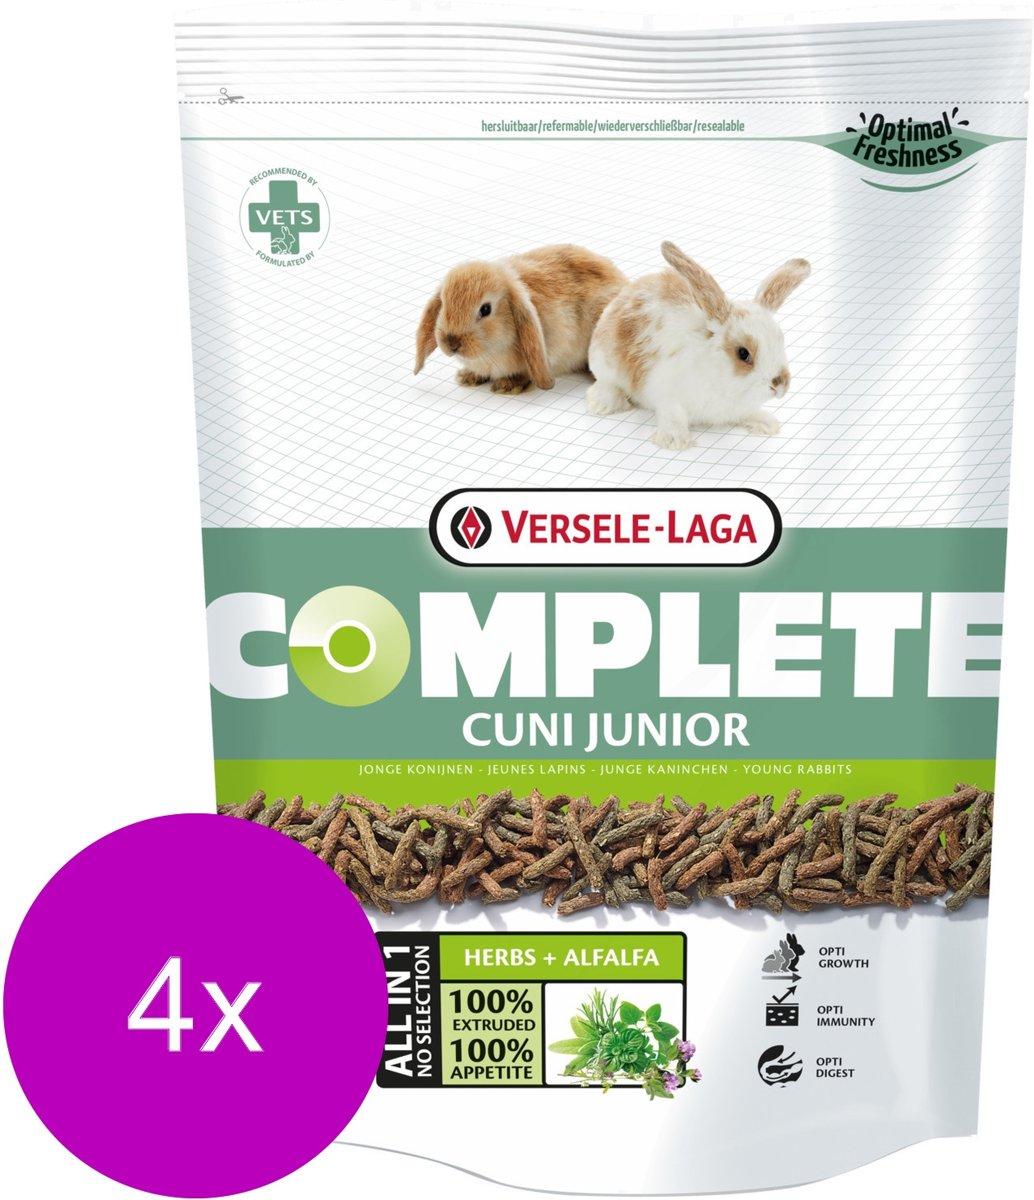 Versele-Laga Complete Cuni Junior - Konijnenvoer - 4 x 500 g